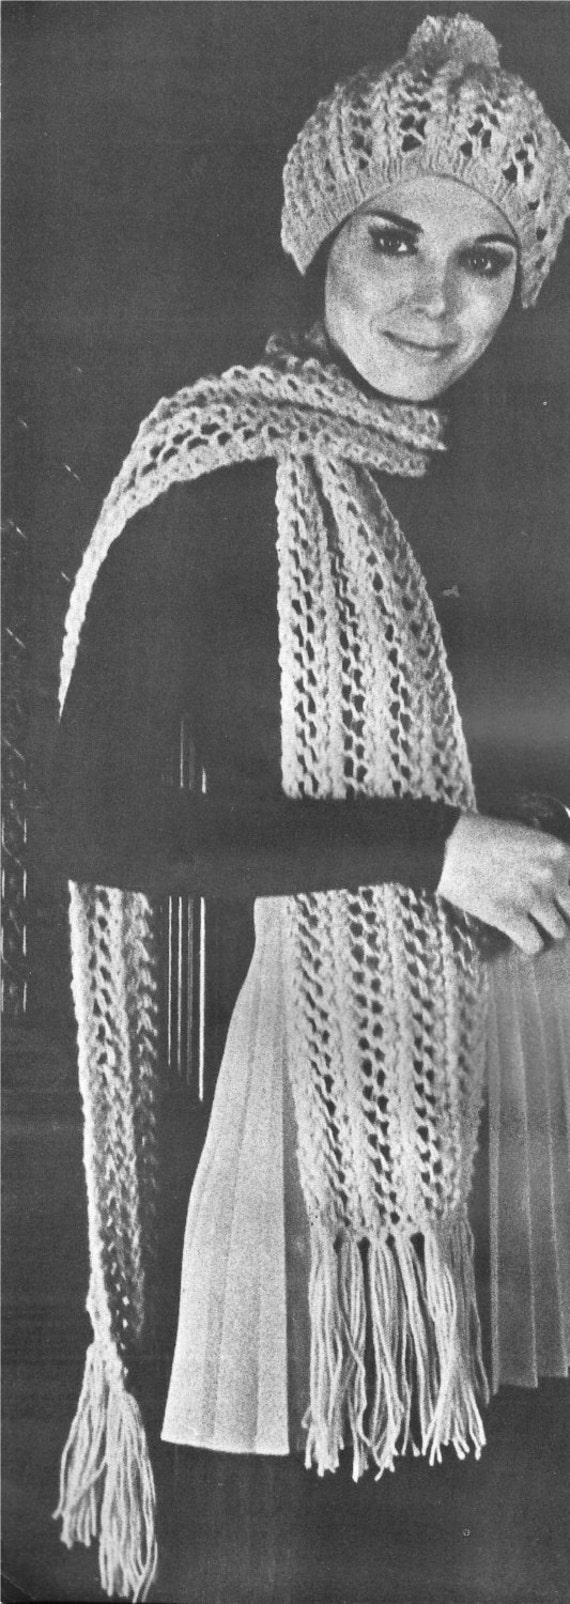 Knitting Pattern Vintage Hat : Knitting Pattern Hat Scarf 1970s vintage pdf instant